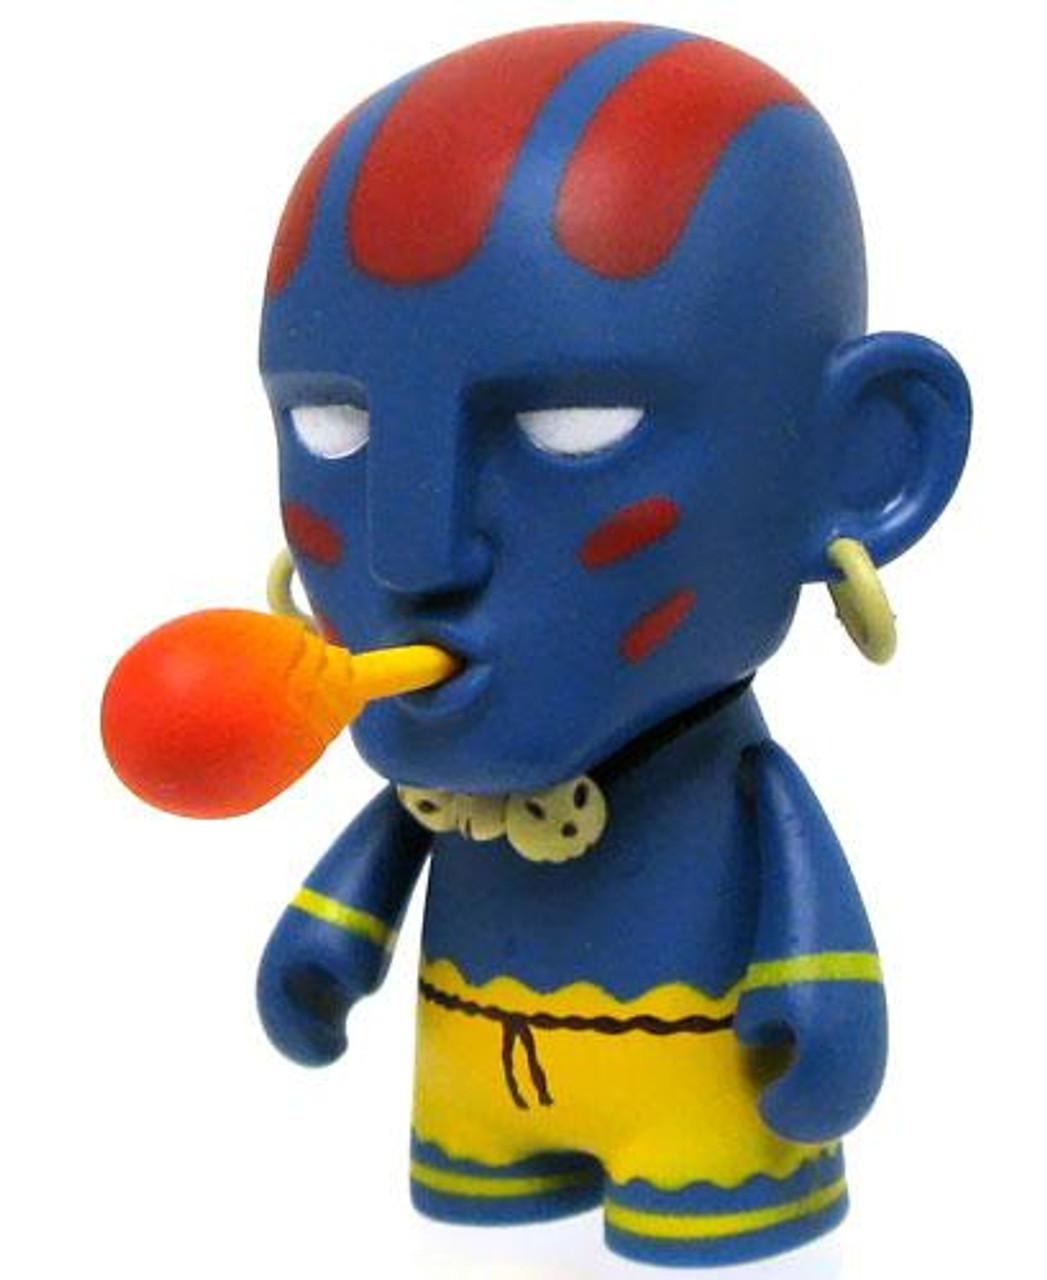 Street Fighter Dhalsim 3-Inch Vinyl Figure [Blue]